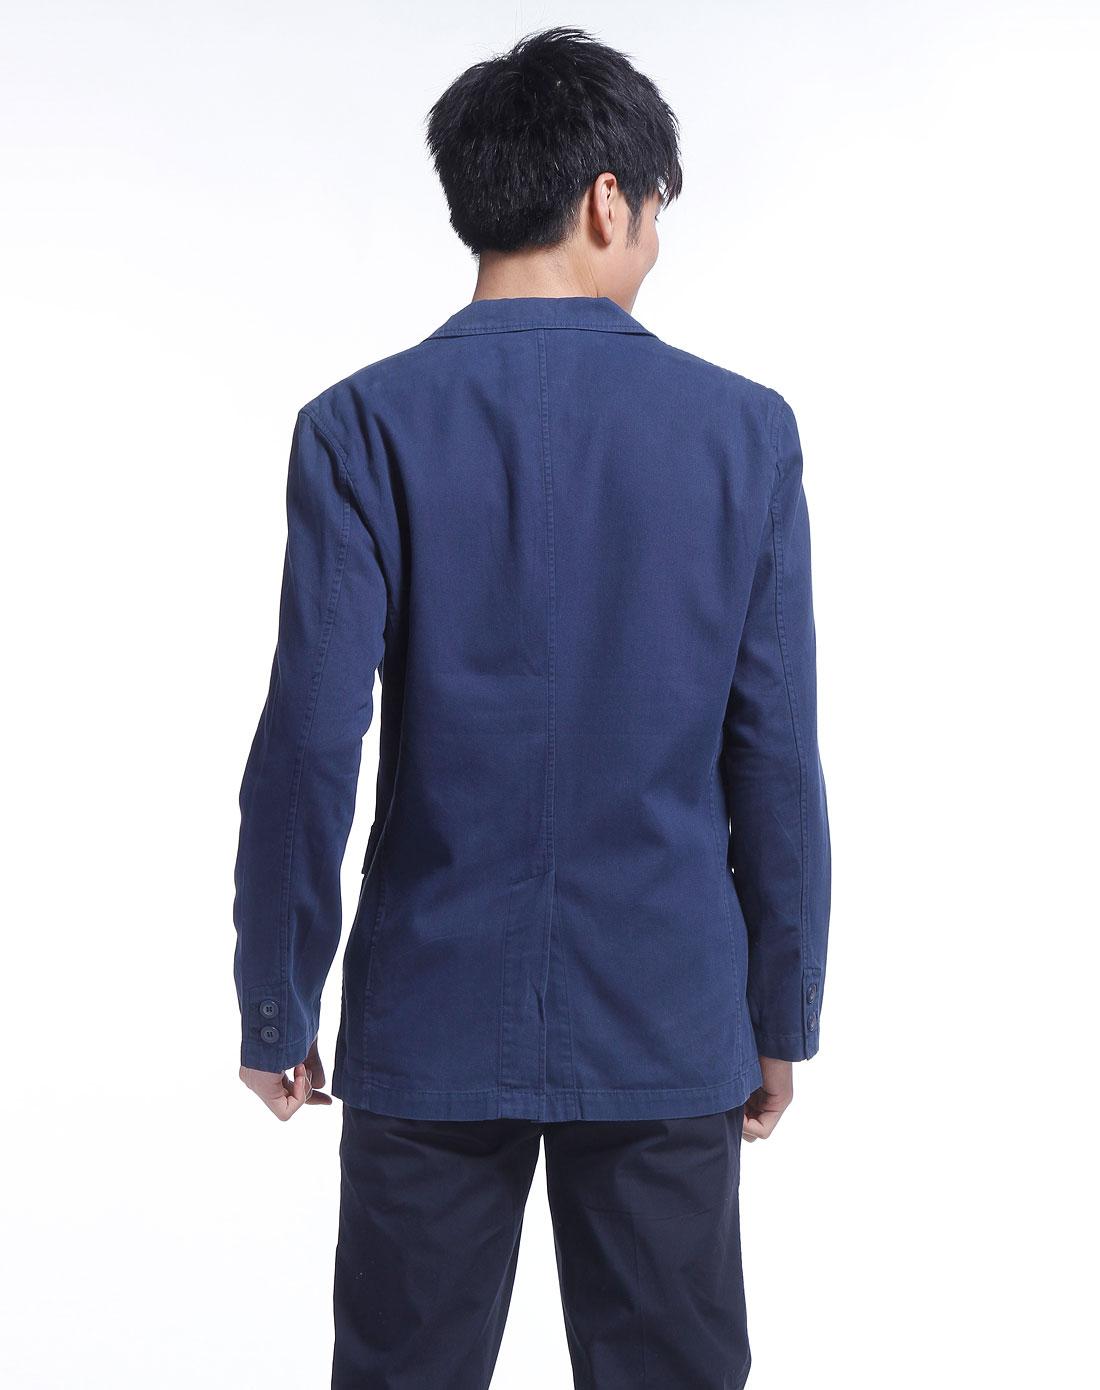 doright深蓝色长袖休闲西装